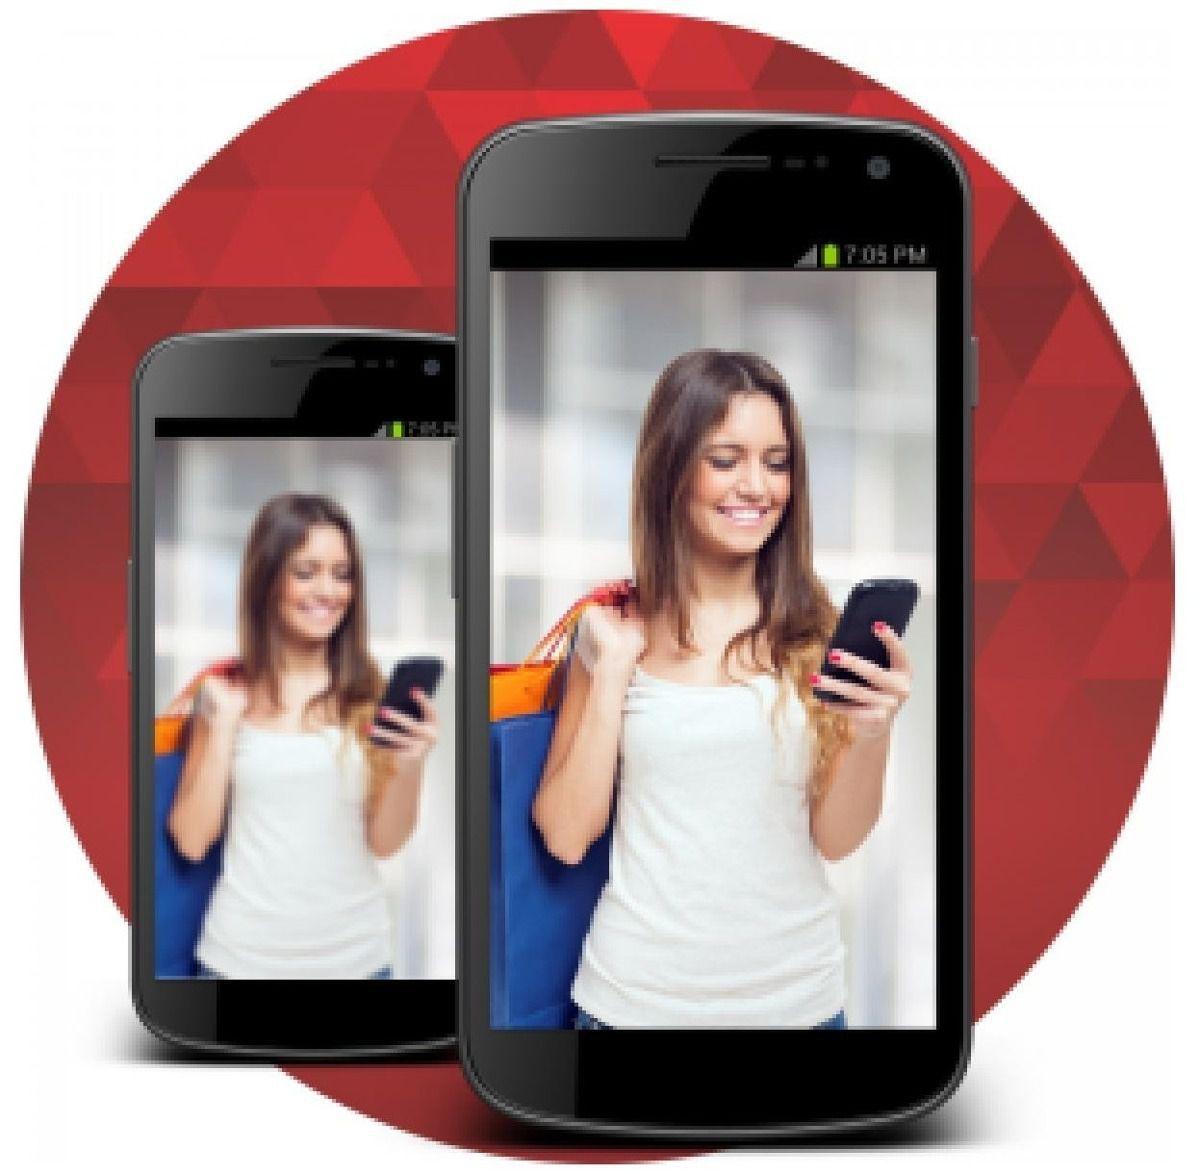 Kit Cftv Hd Luxvision Full Hd Dvr 8 Ch 8 Câmeras Ahd 2.0mp Anúncio com variação